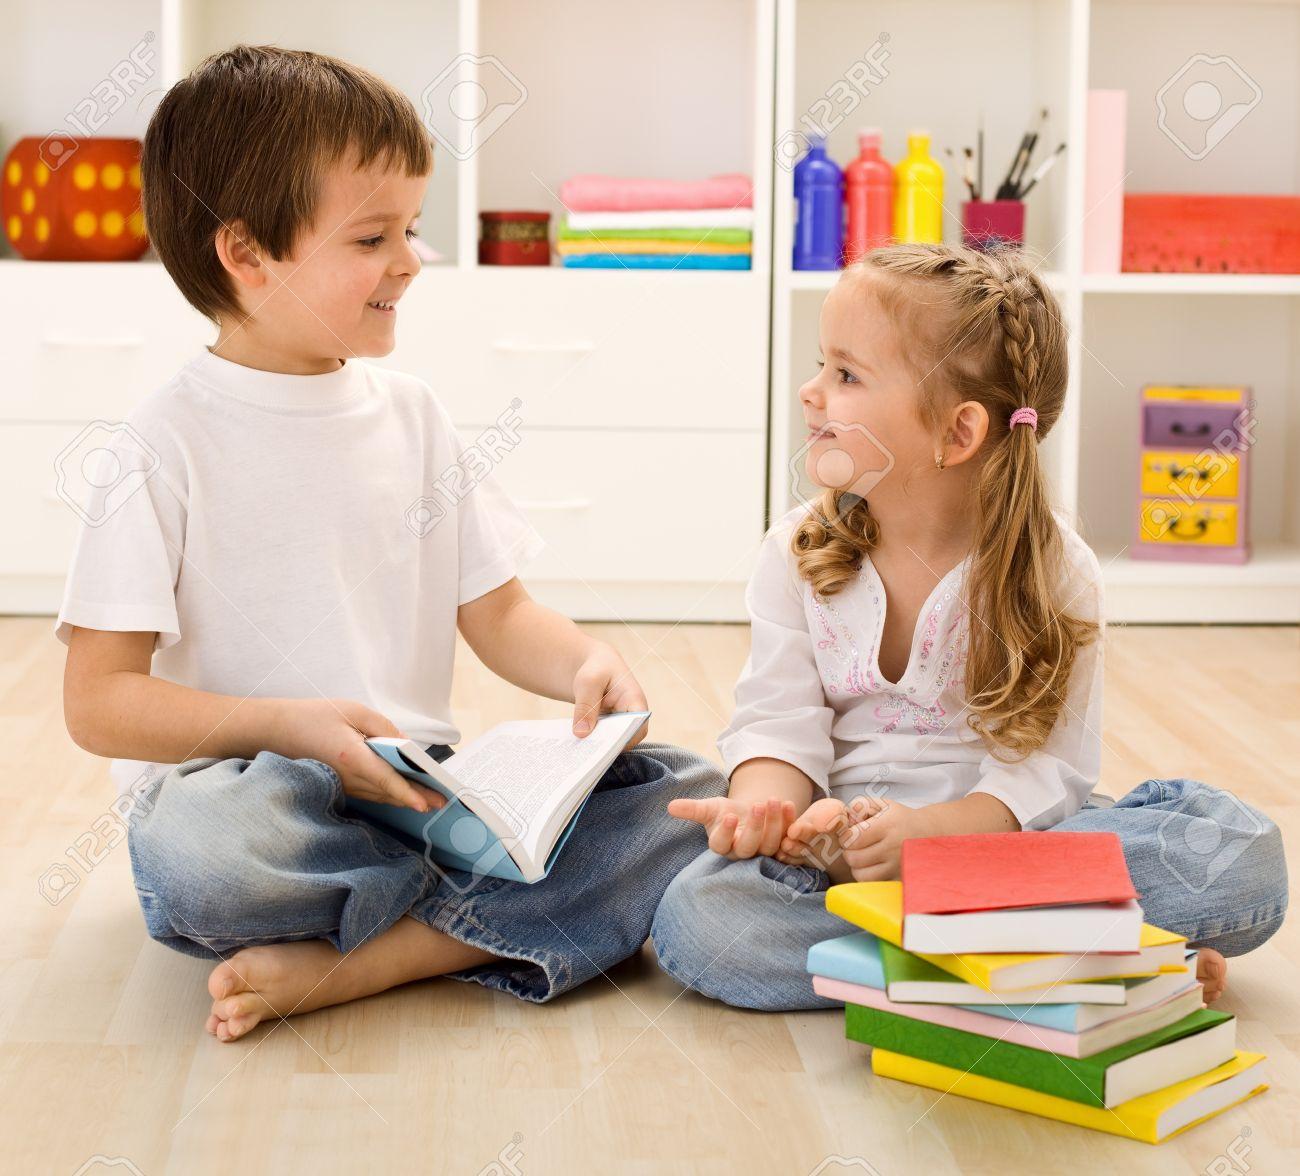 Boy Holding Popcorn While Siblings Talking At Stock Photo - Image ...